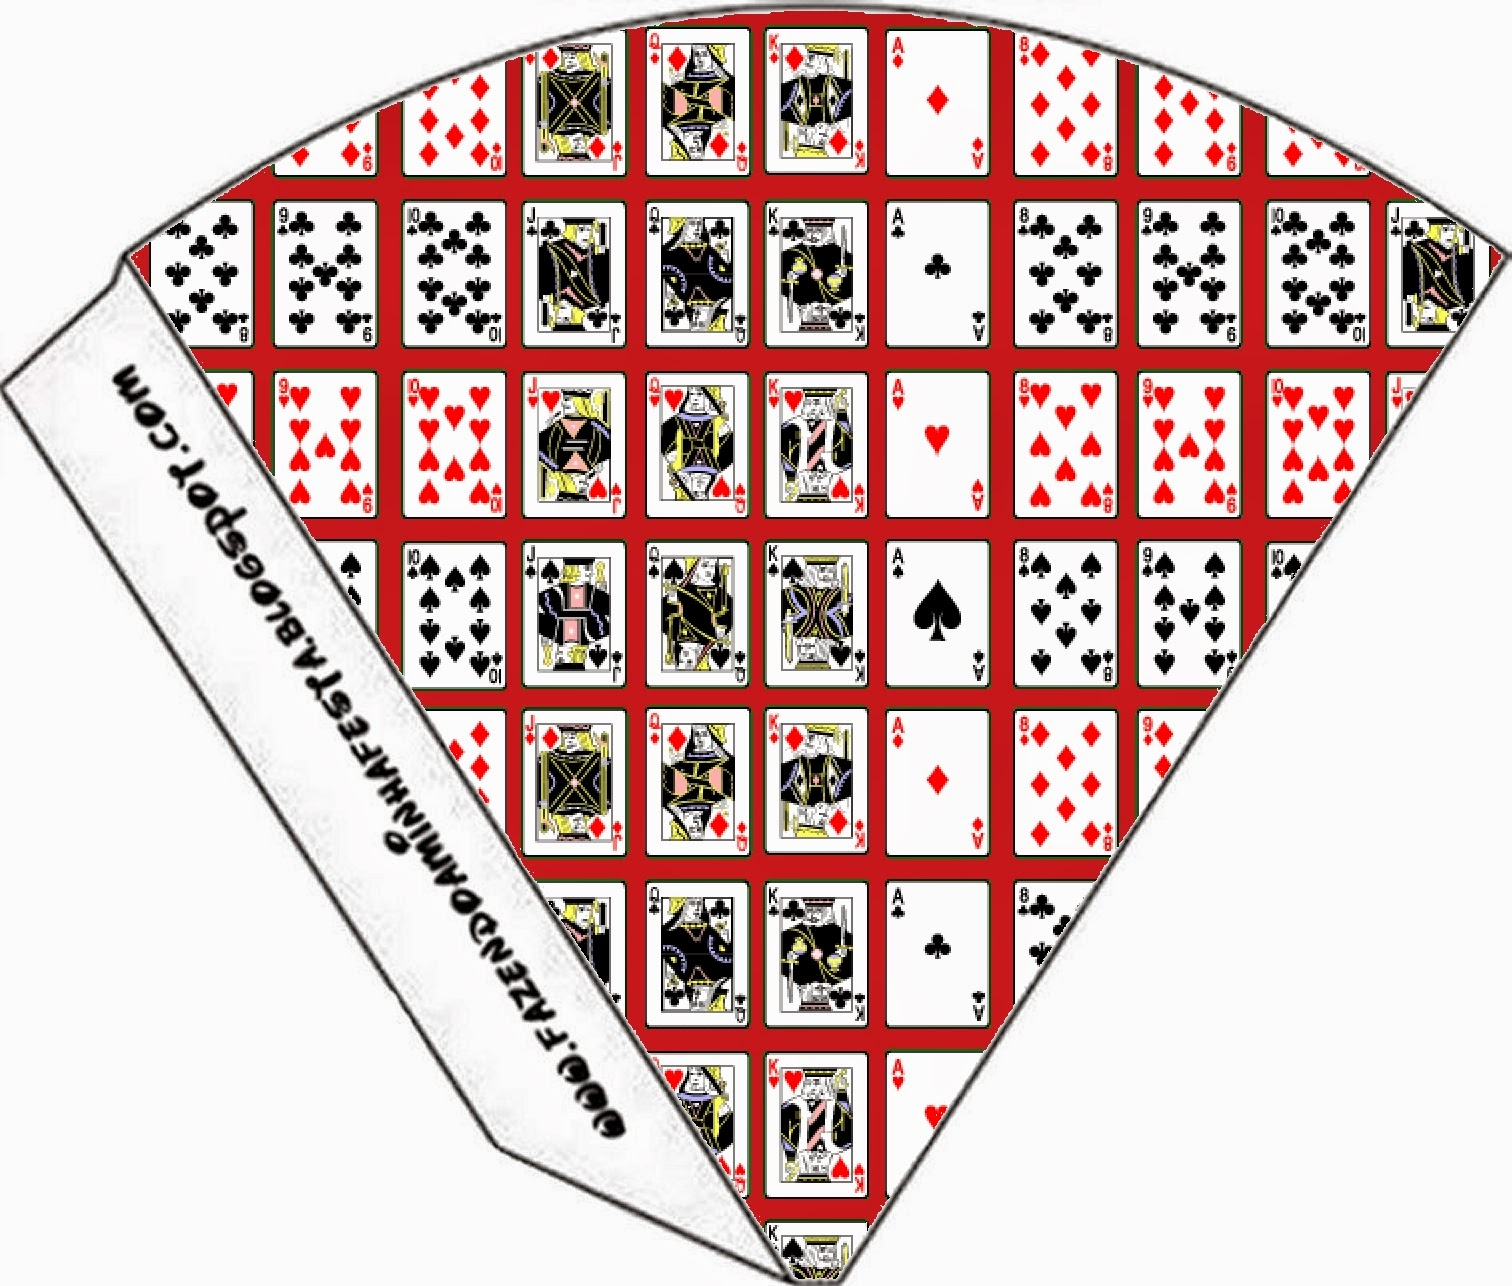 Freeprintables: Poker Free Party Printables.